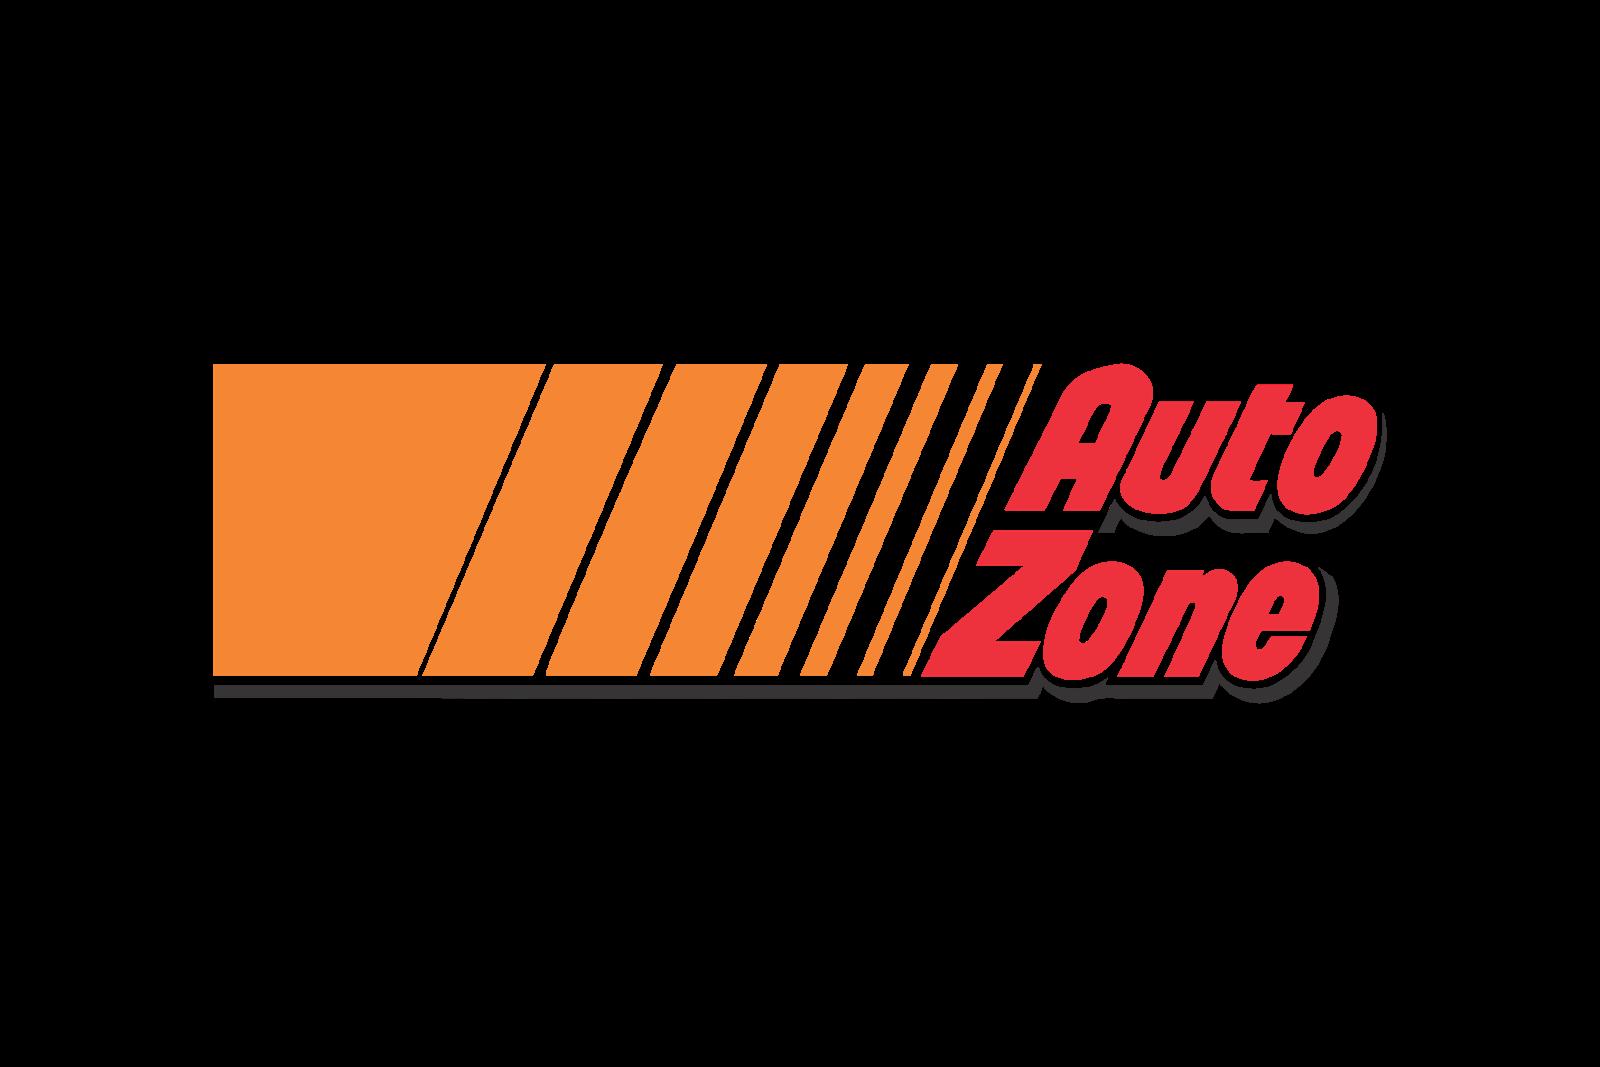 auto zone logo 2017   2018 best cars reviews